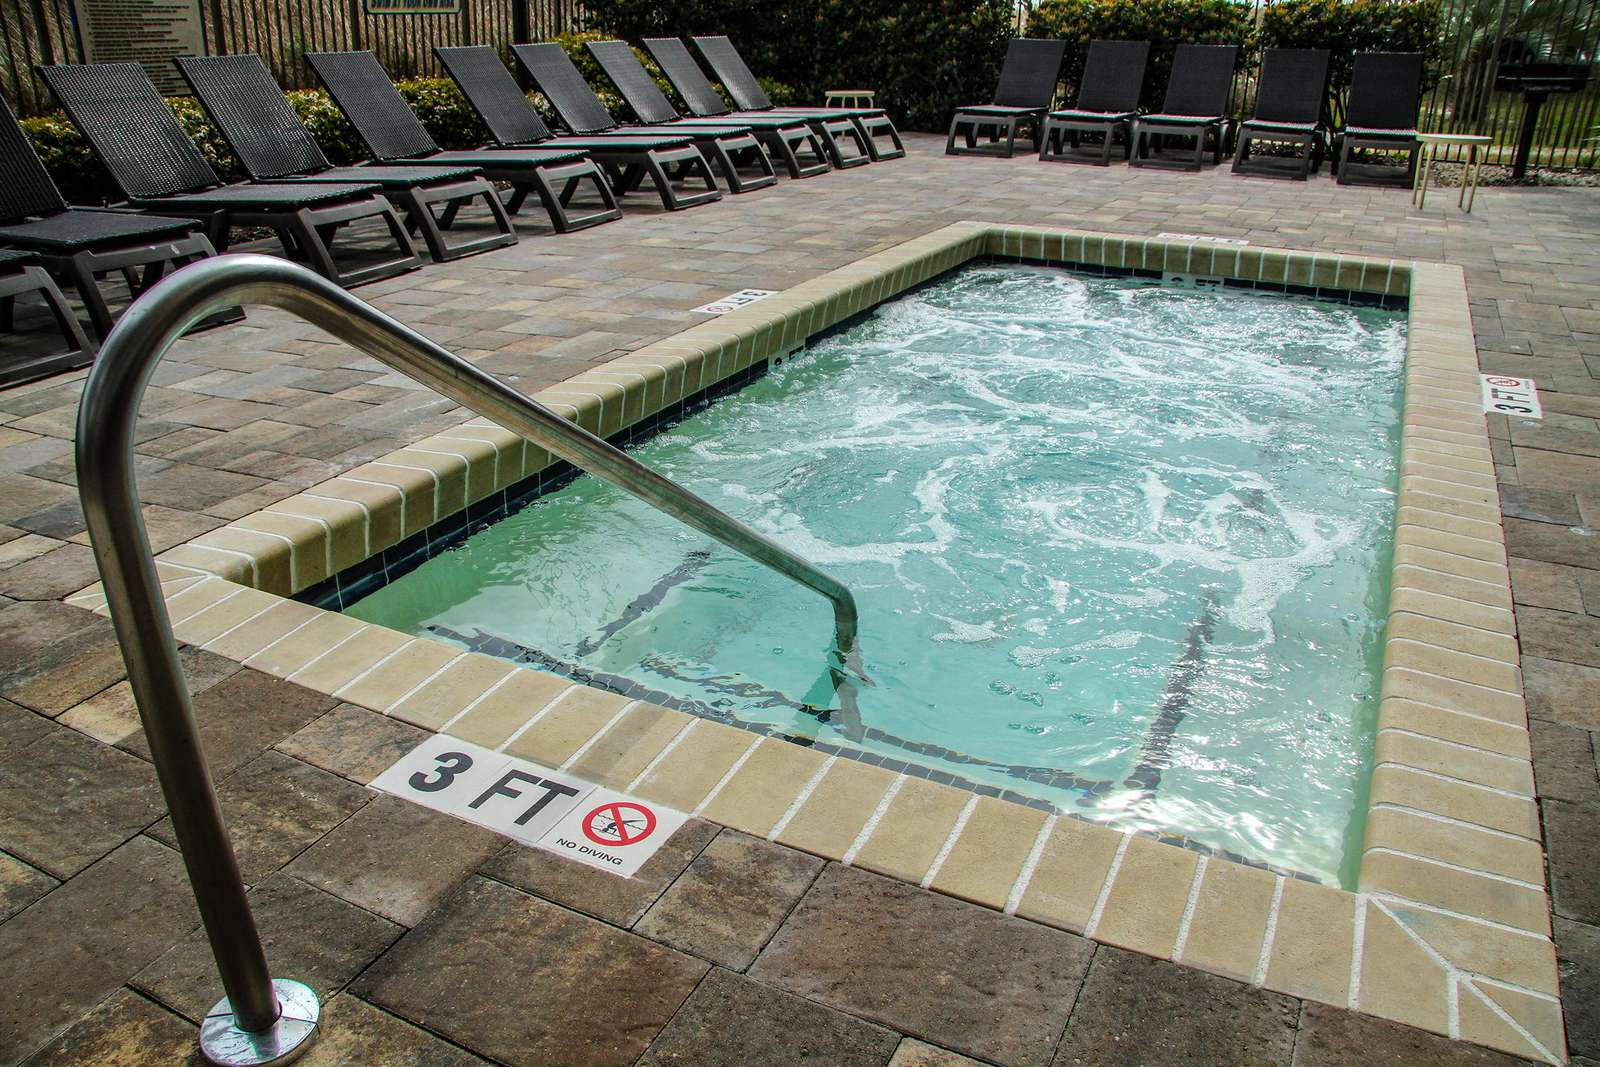 Outdoor hot tub area